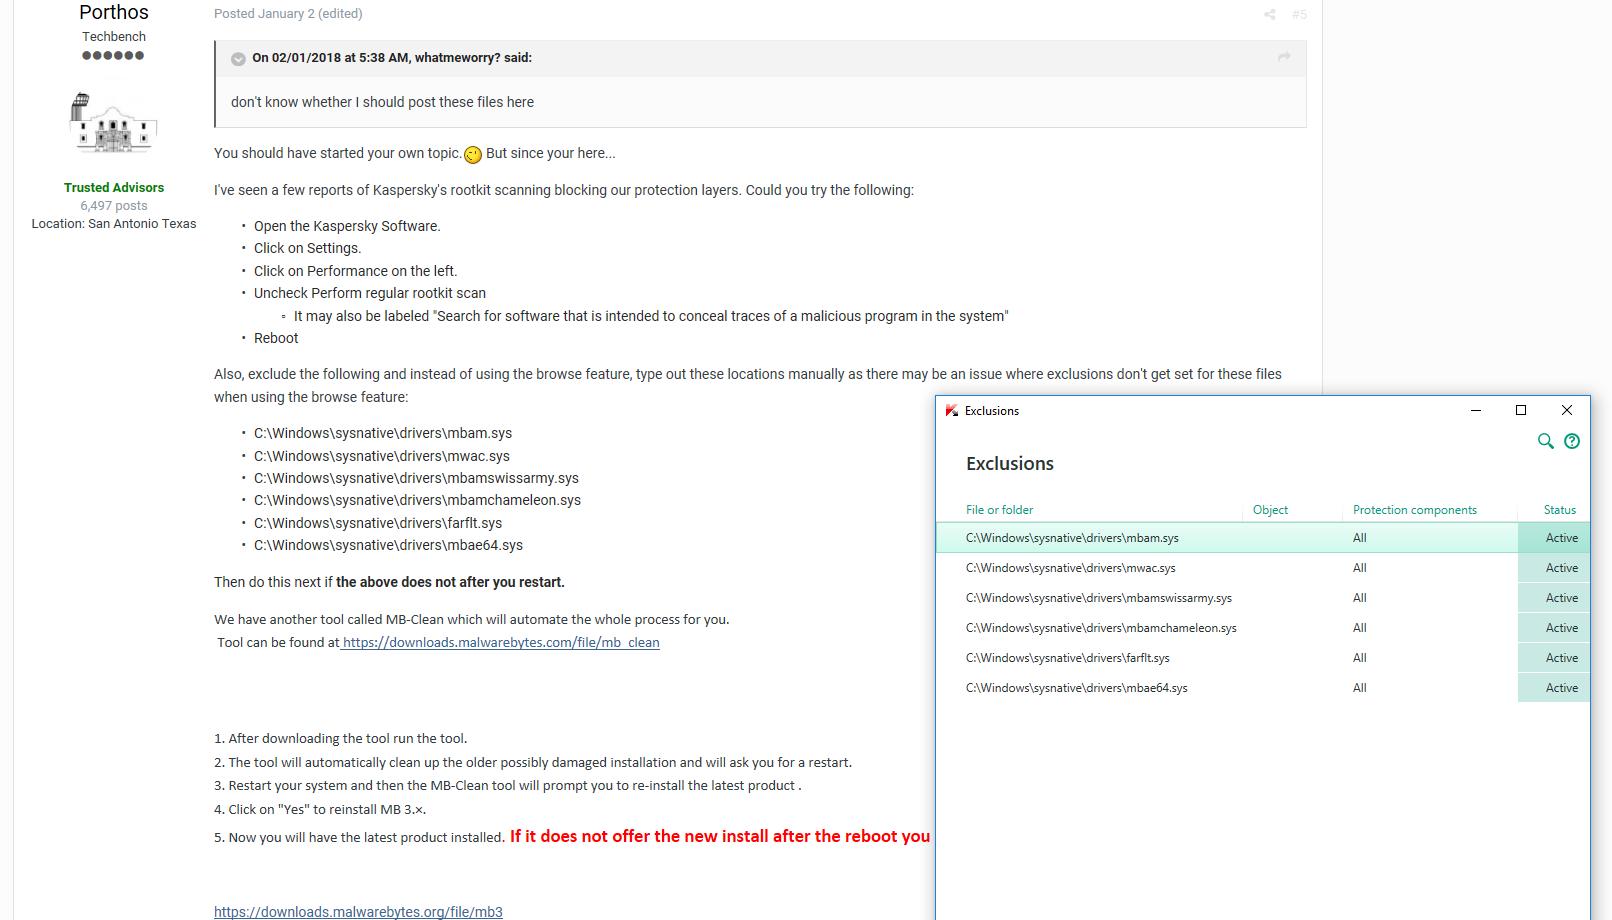 malwarebytes turn off real time protection notification